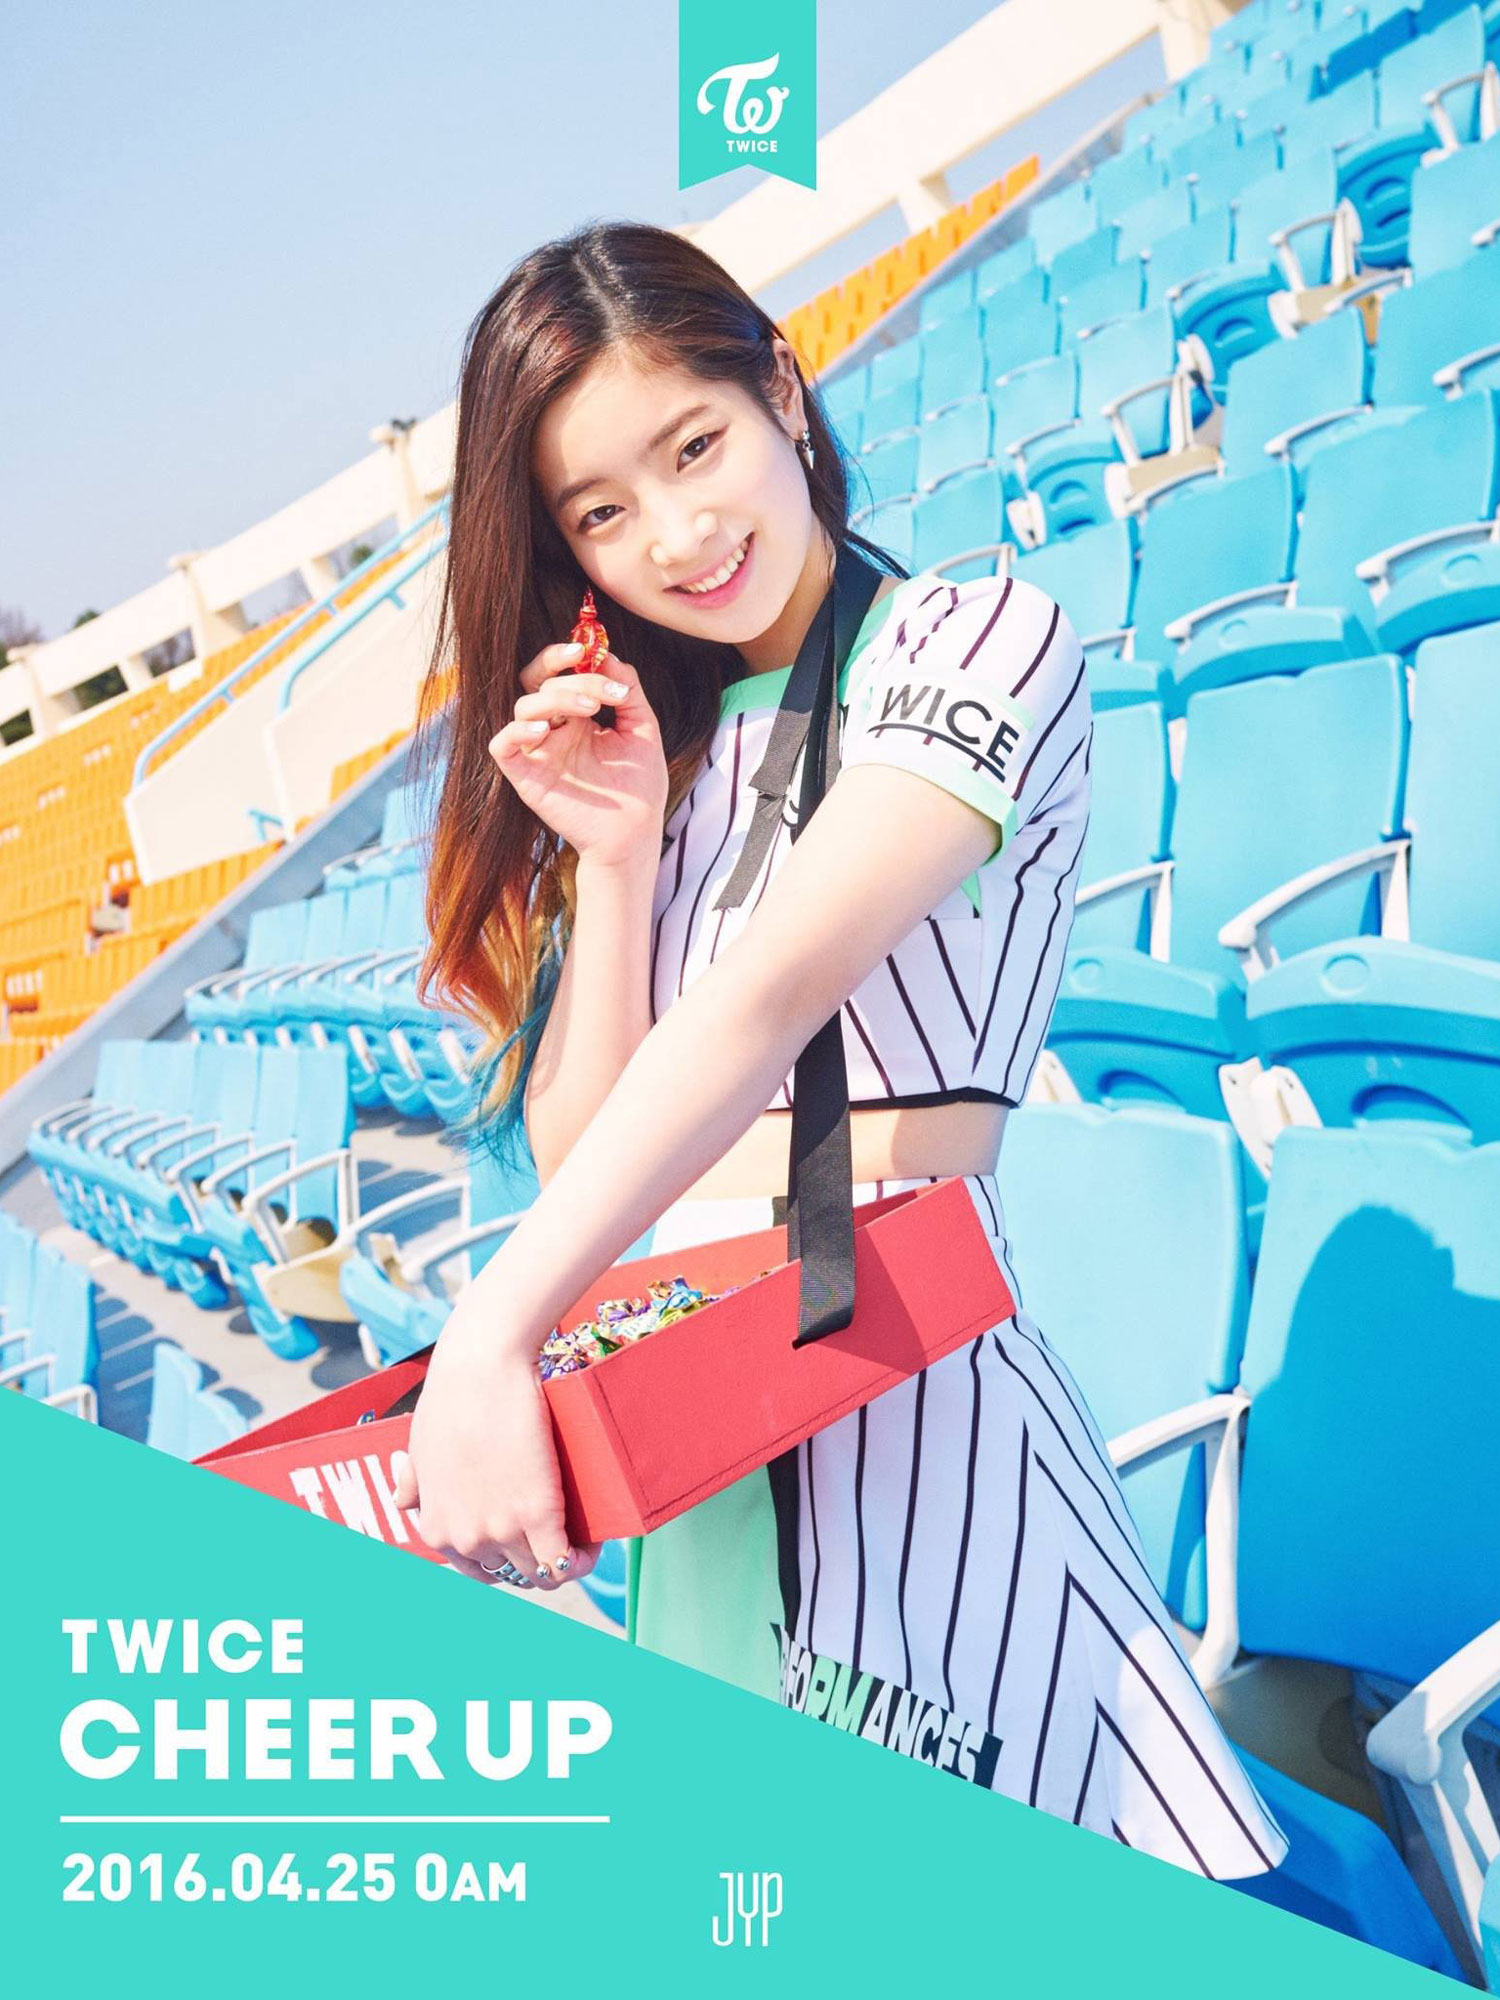 TWICE Dahyun Cheer Up album concept photo